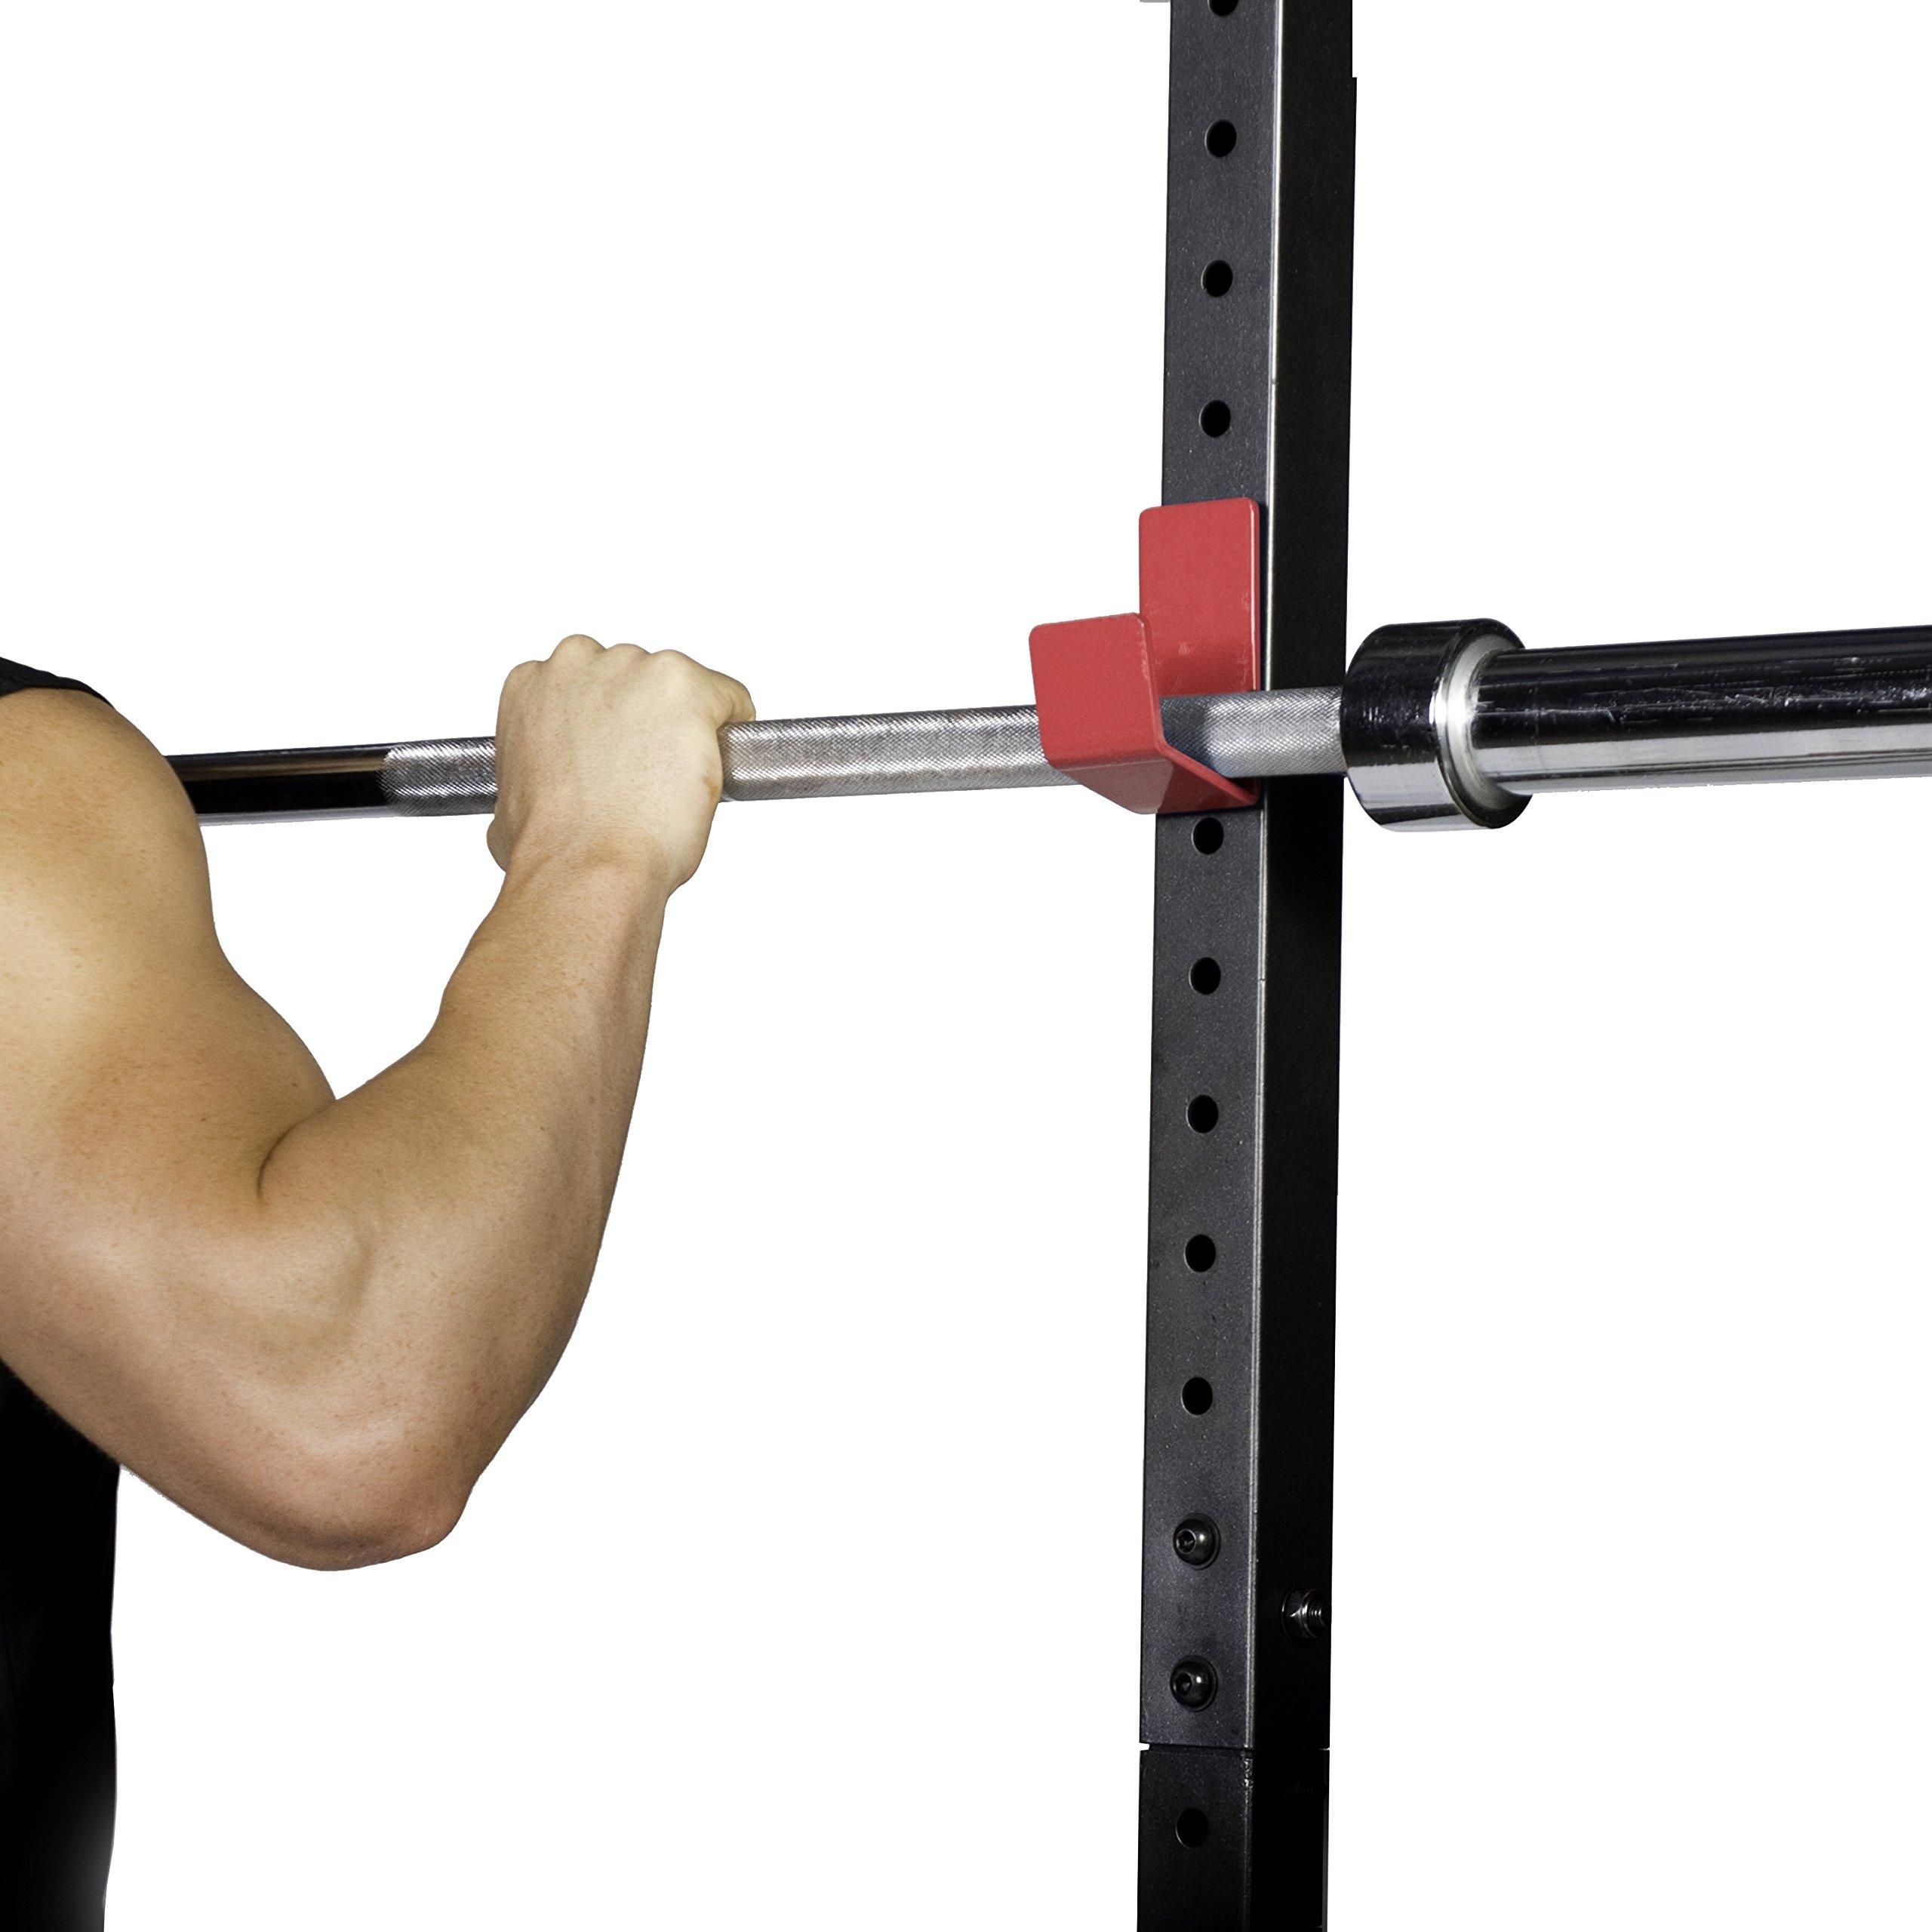 equipment storage rack vertical bar york verticalmachinebarrack machine gym barbell product